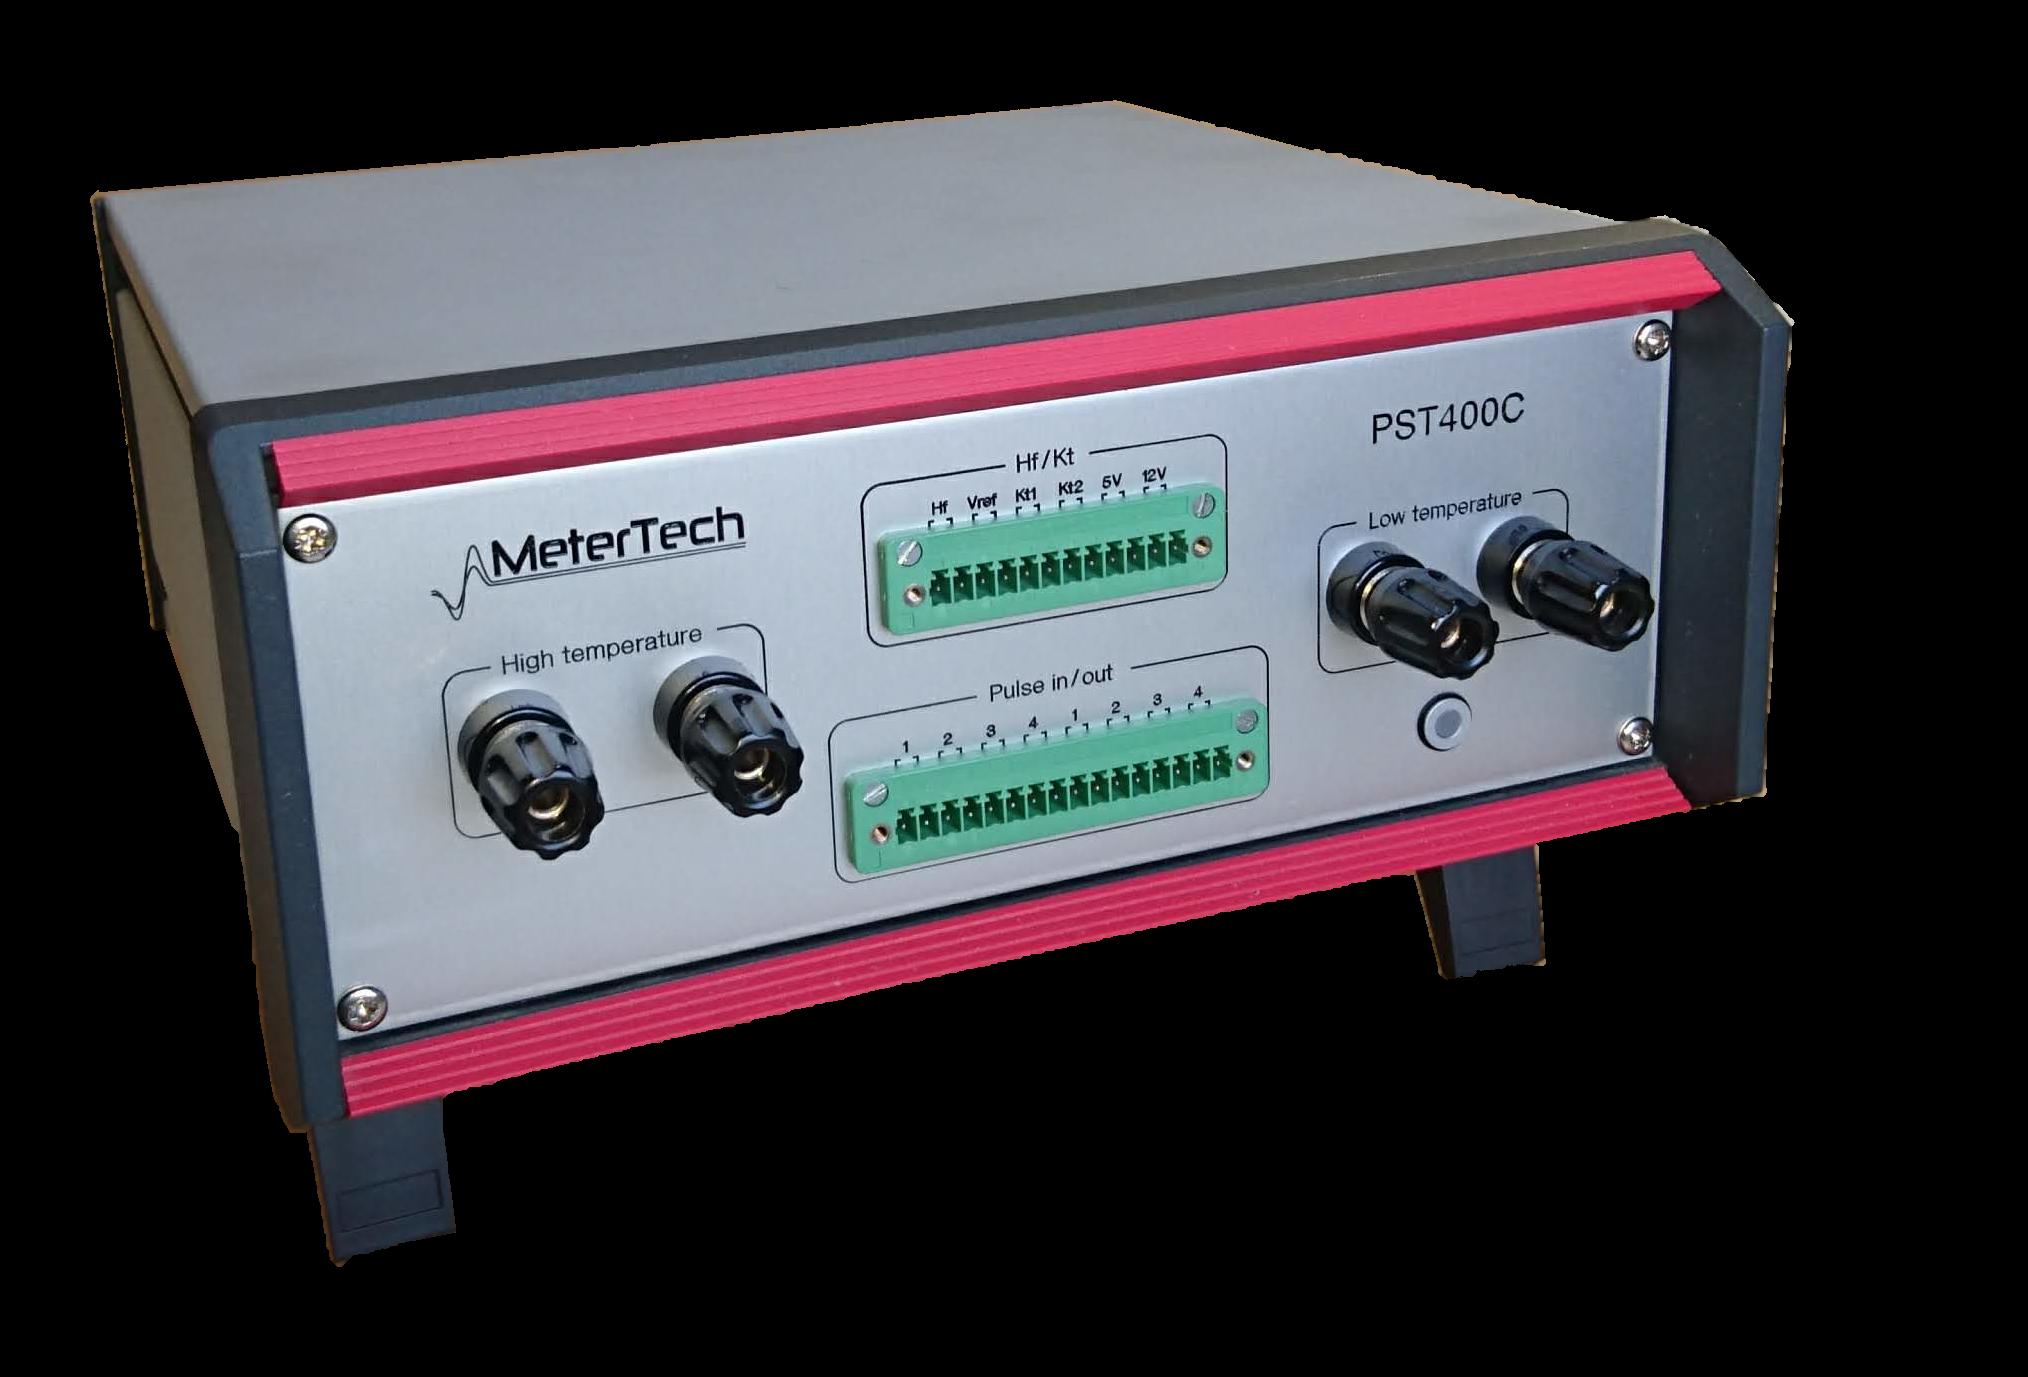 PSt400C MT - ICM Technologies GmbH